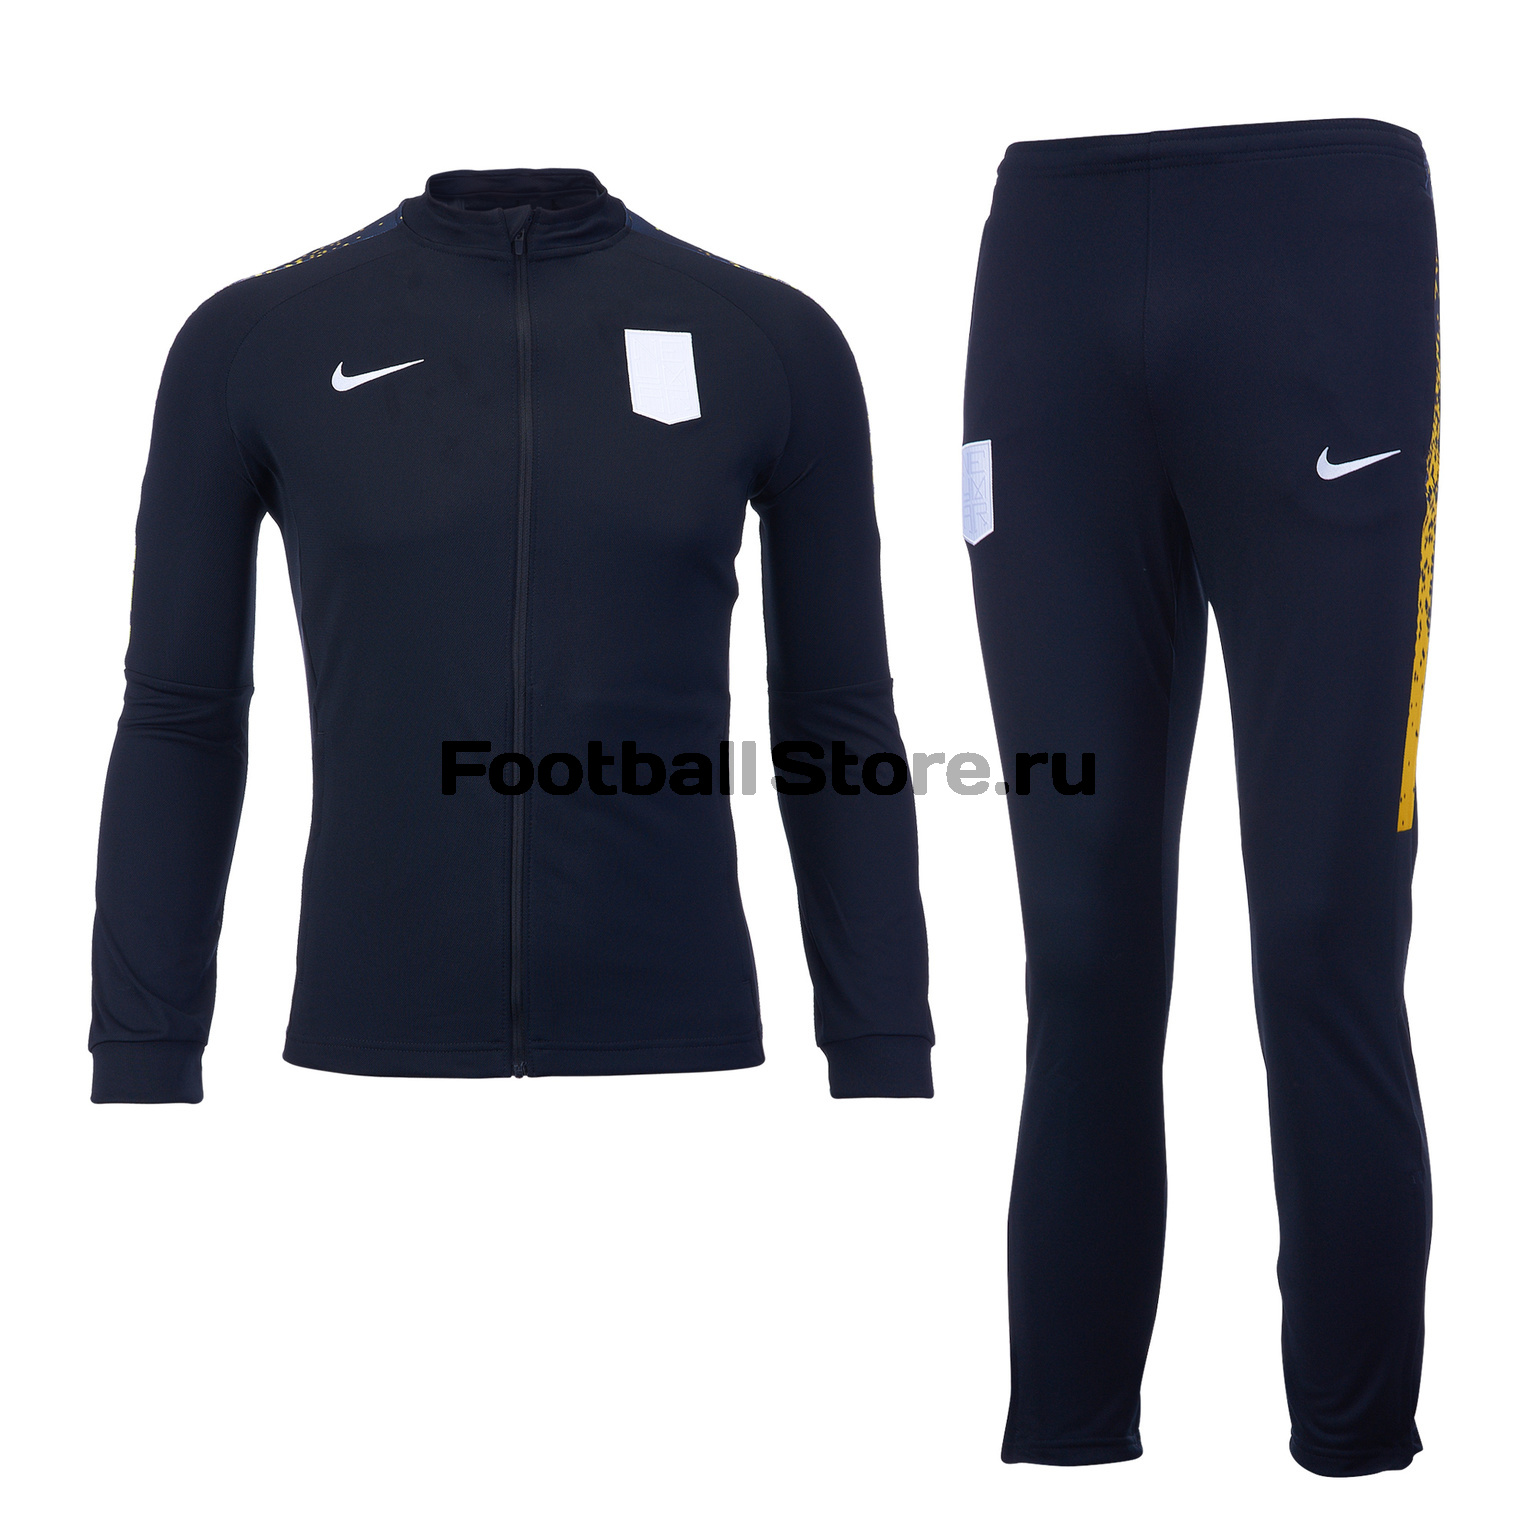 Костюм подростковый Nike Neymar 925120-010